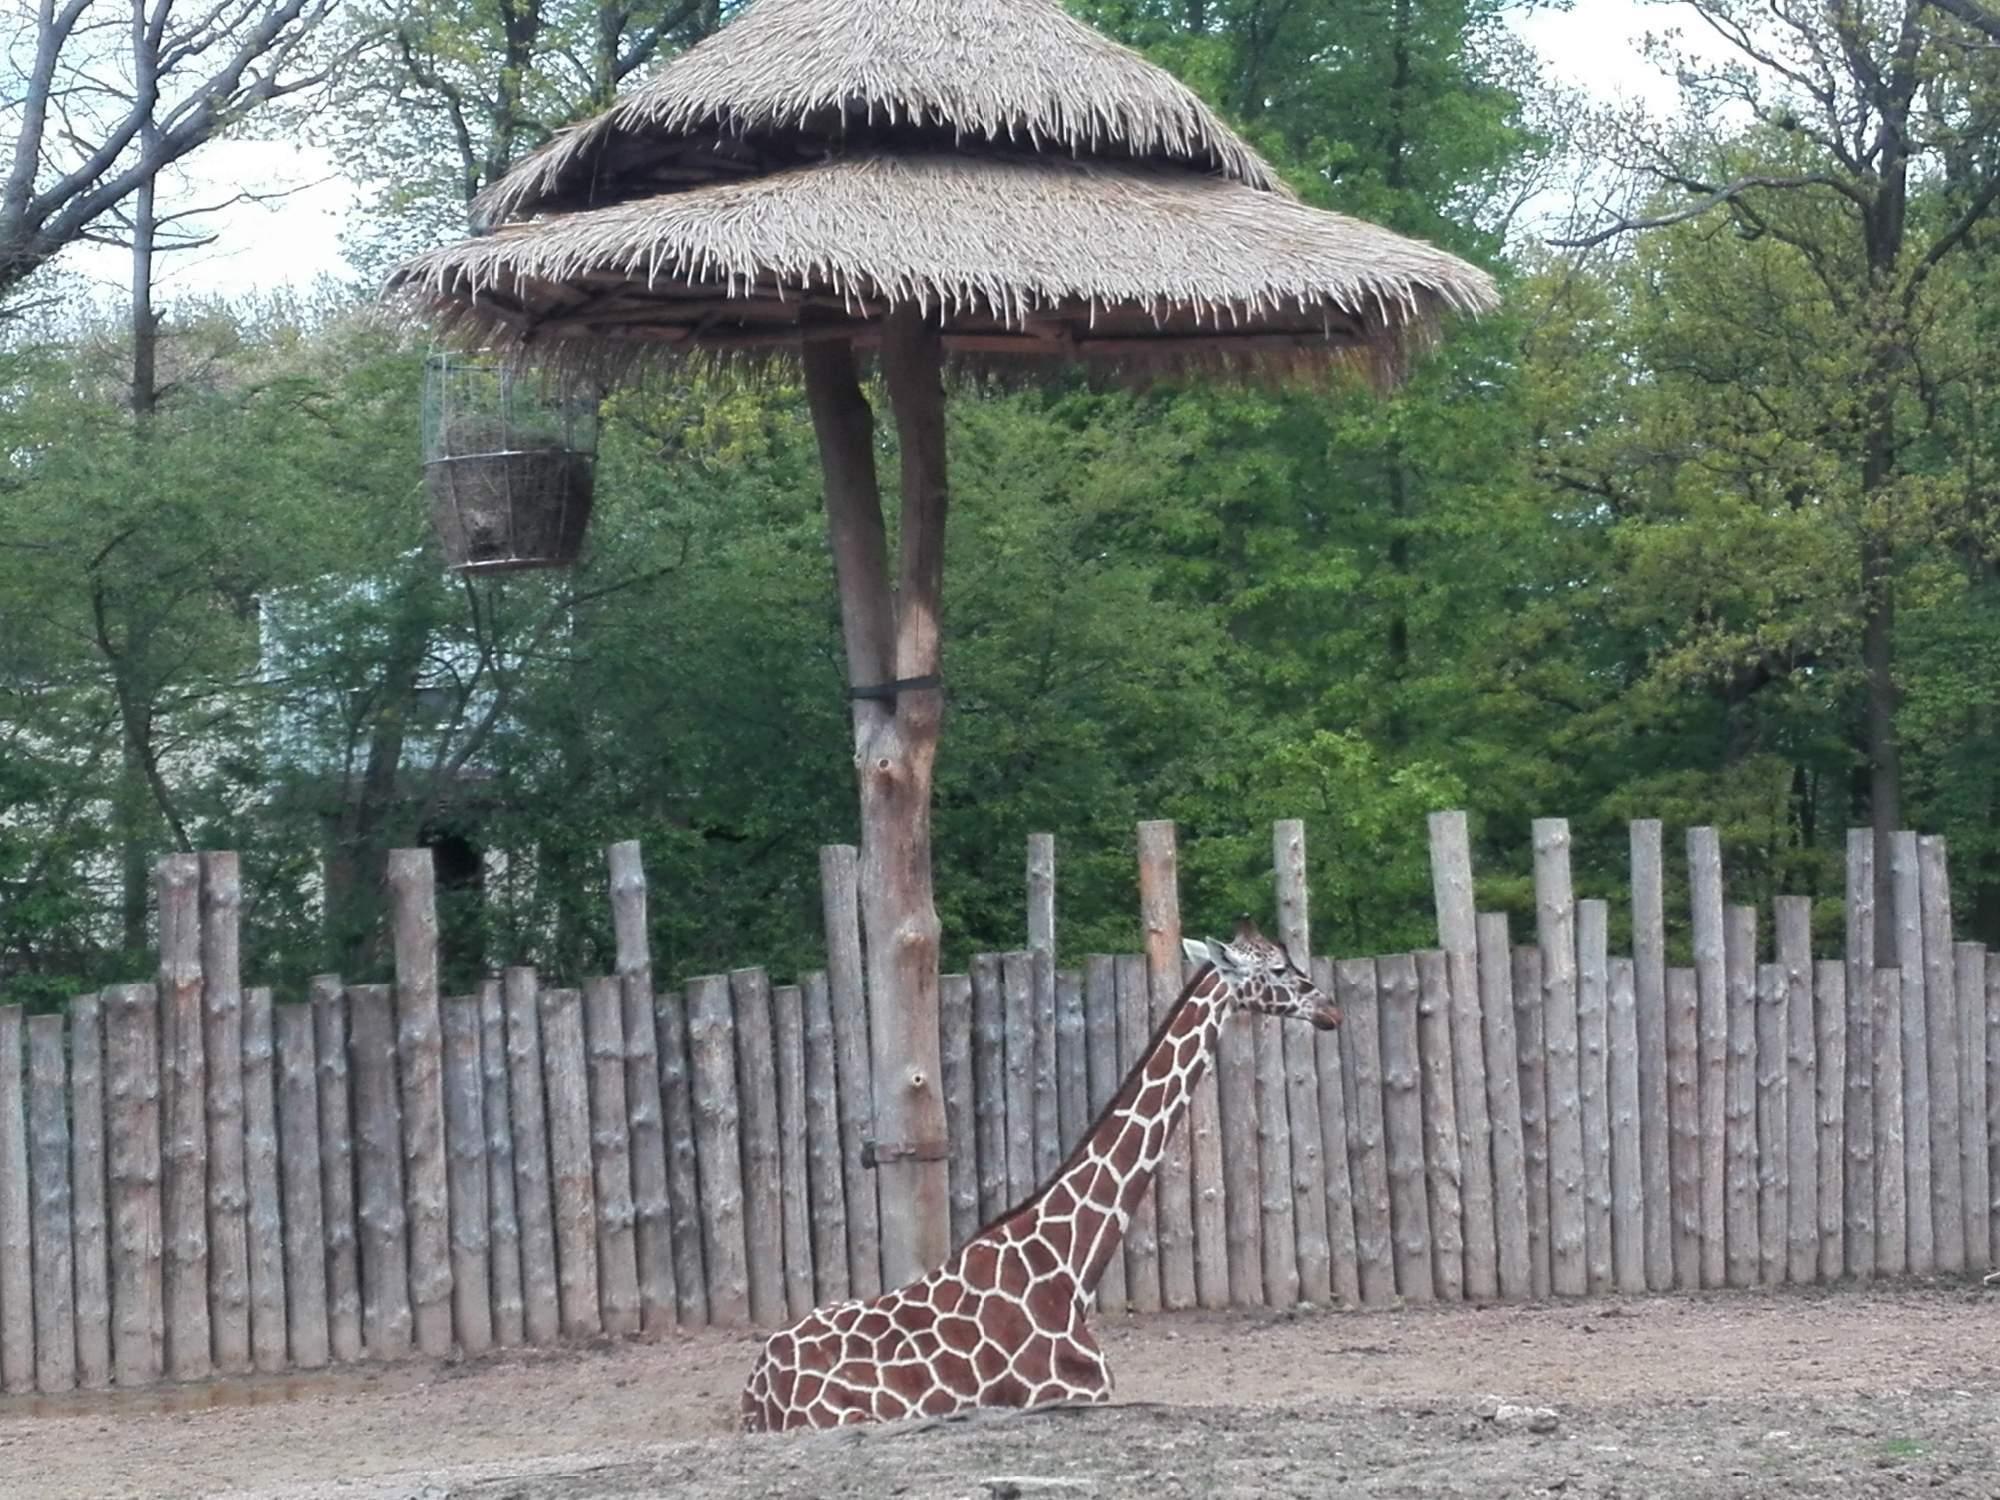 Komentovaného krmení se dočkaly i žirafy. Foto: Dominika Vrbecká